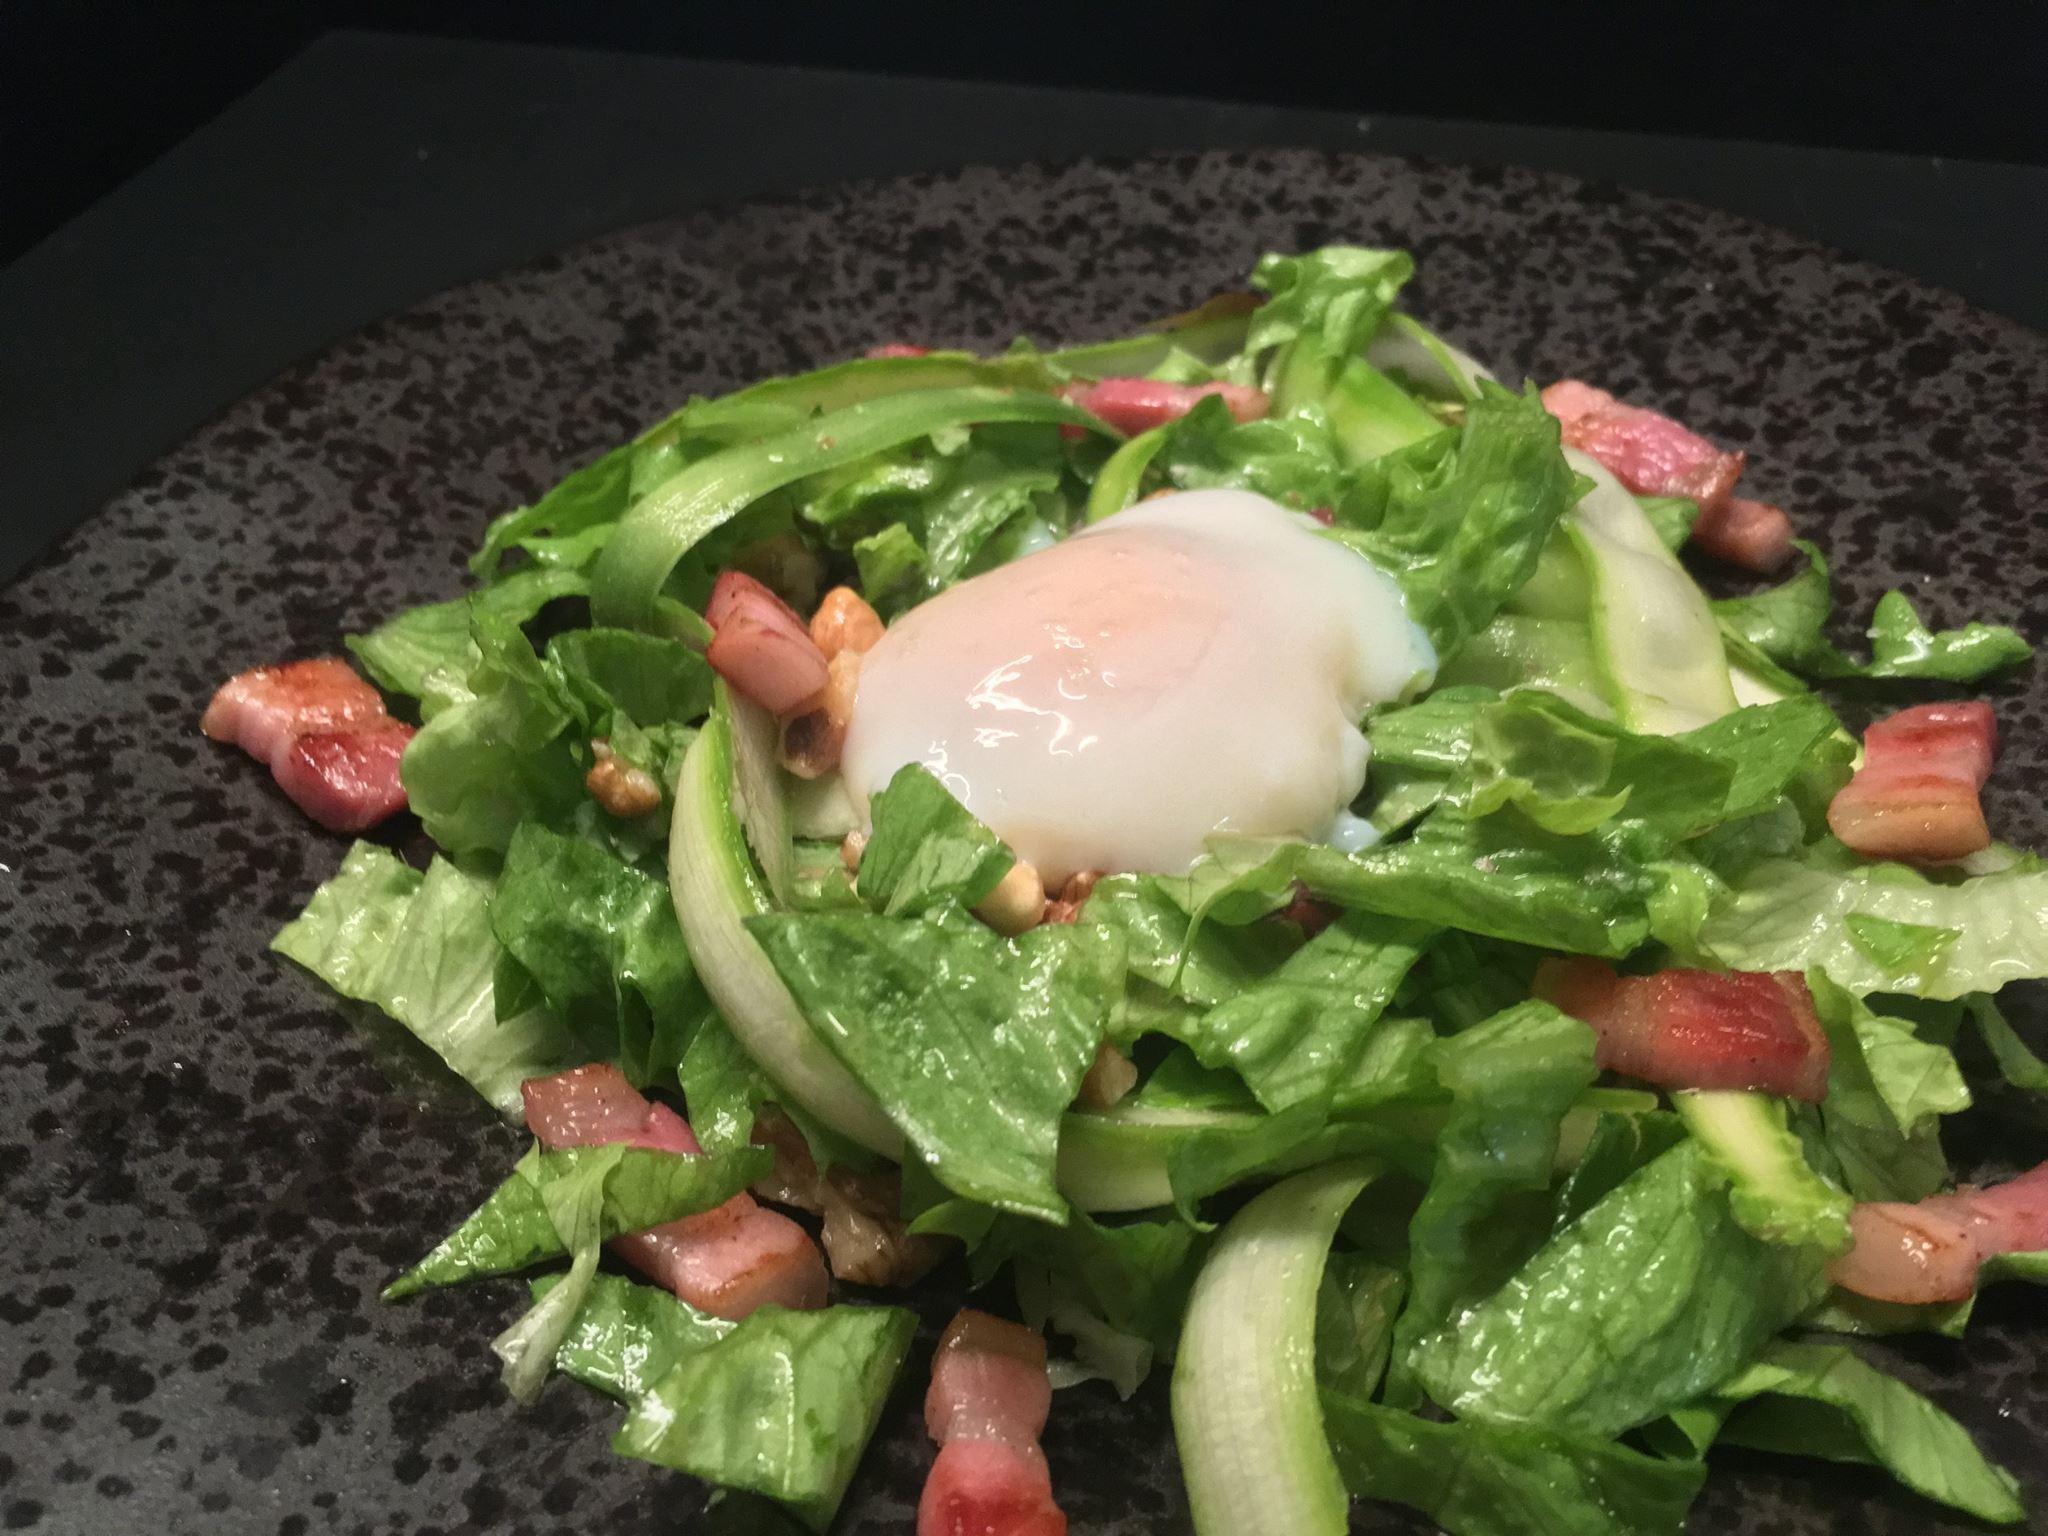 Salade d'asperges vertes et son